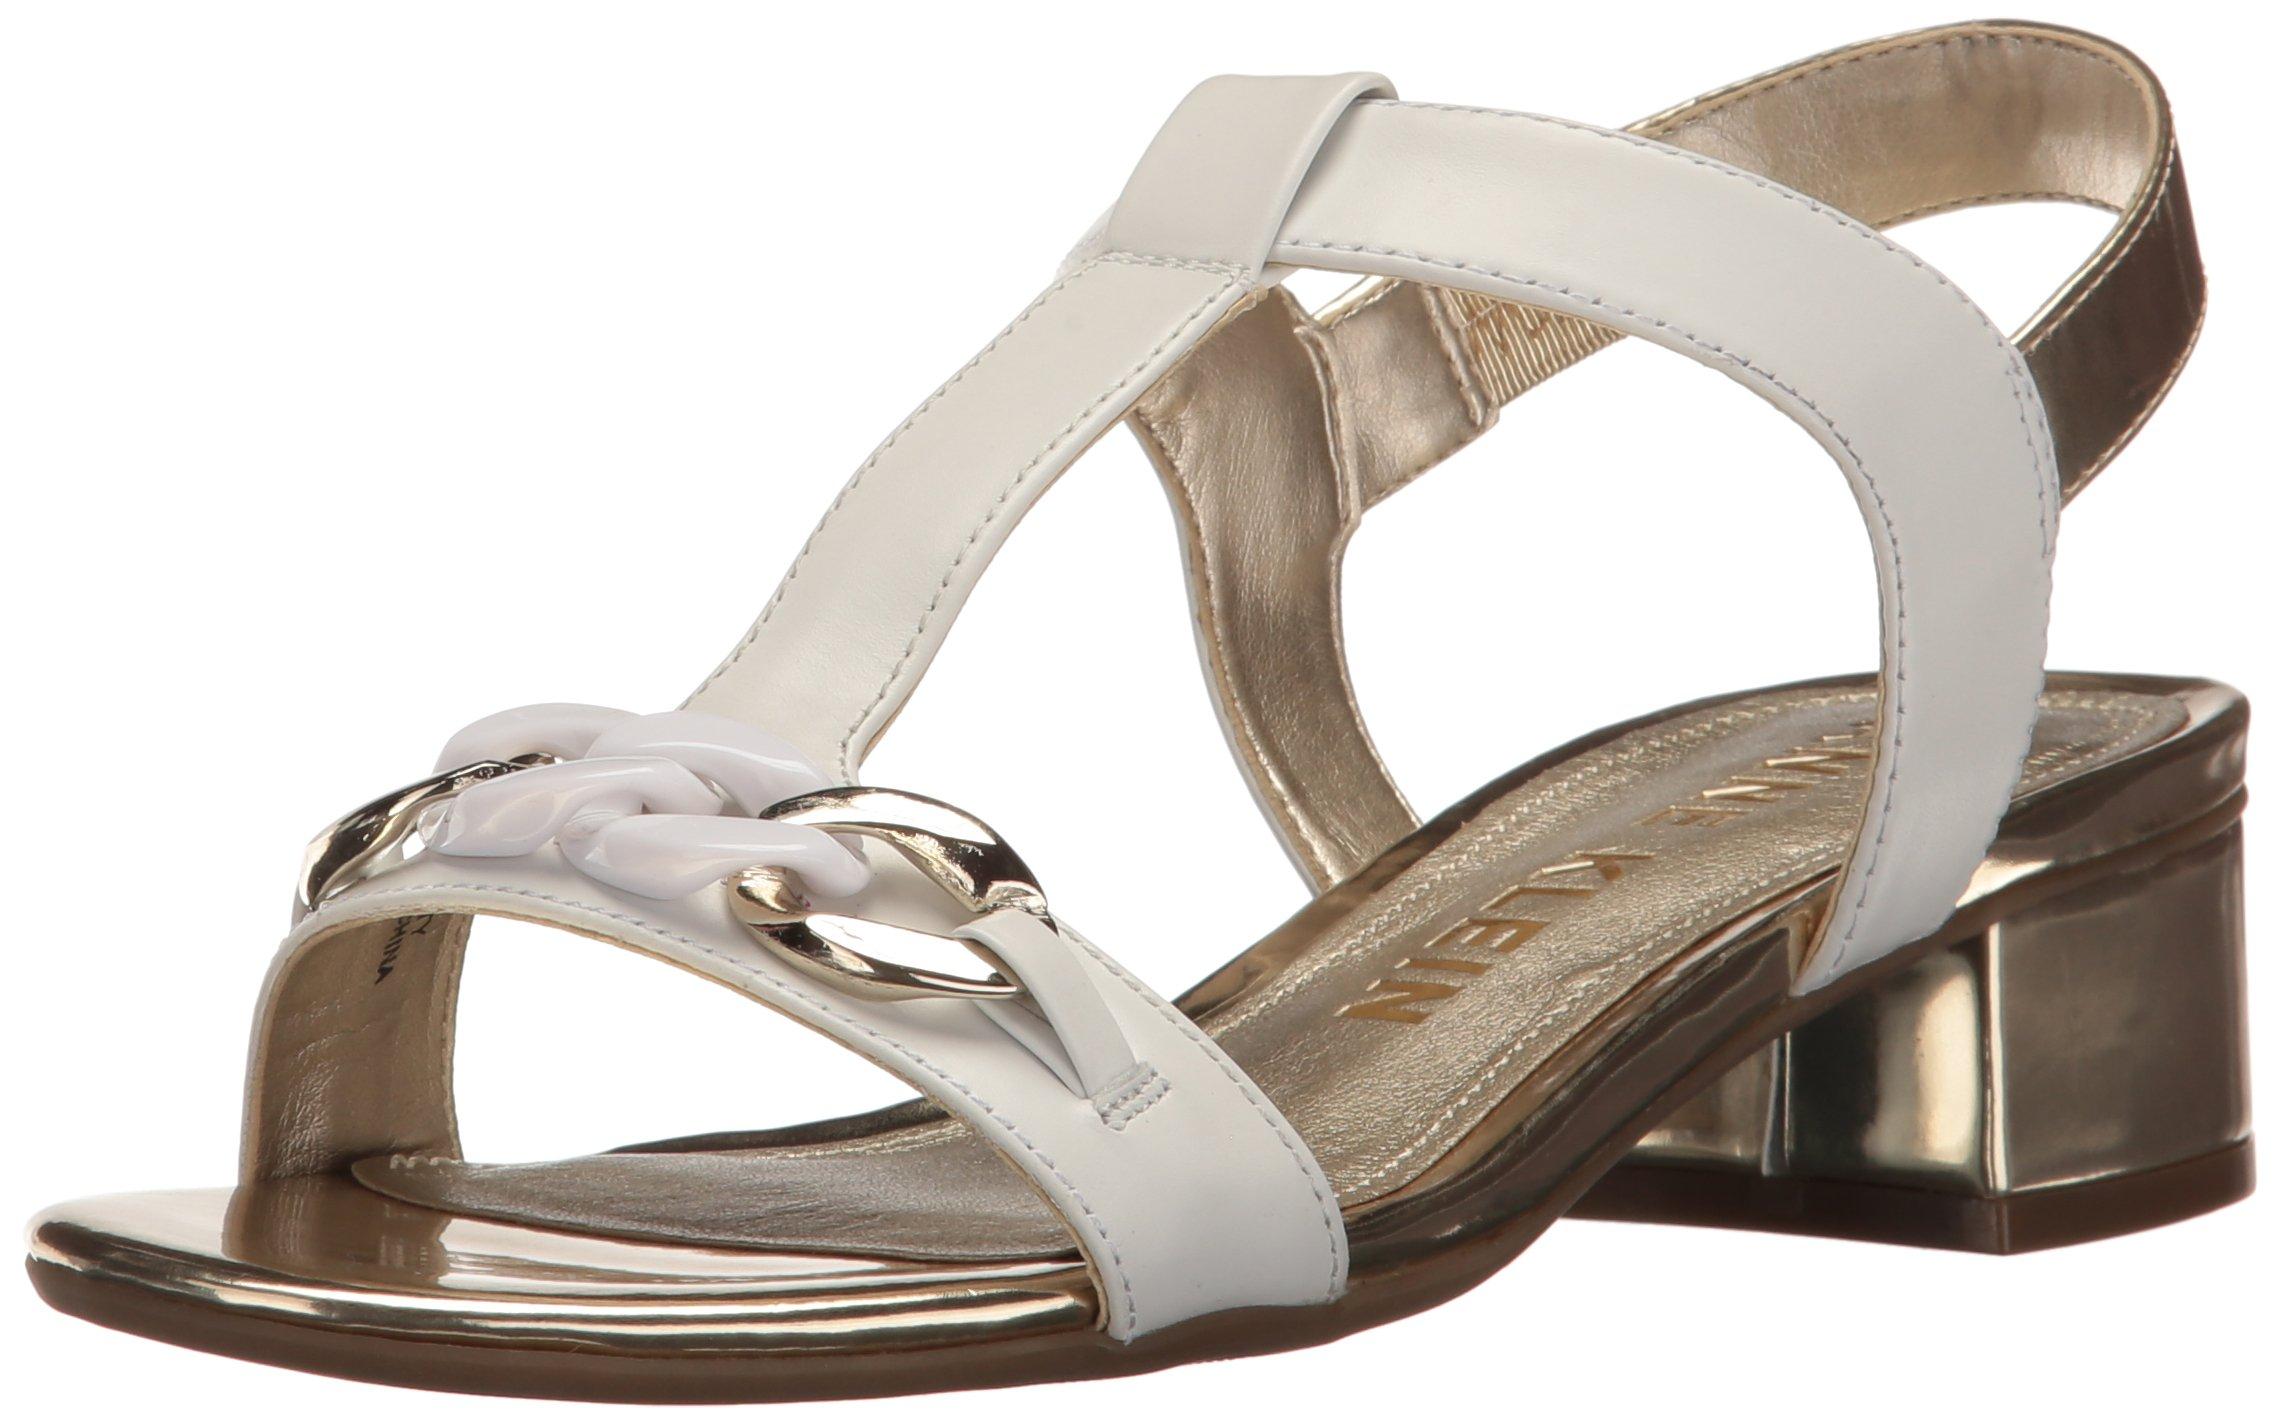 Anne Klein Women's Entity Leather, White/Gold, 6.5 M US